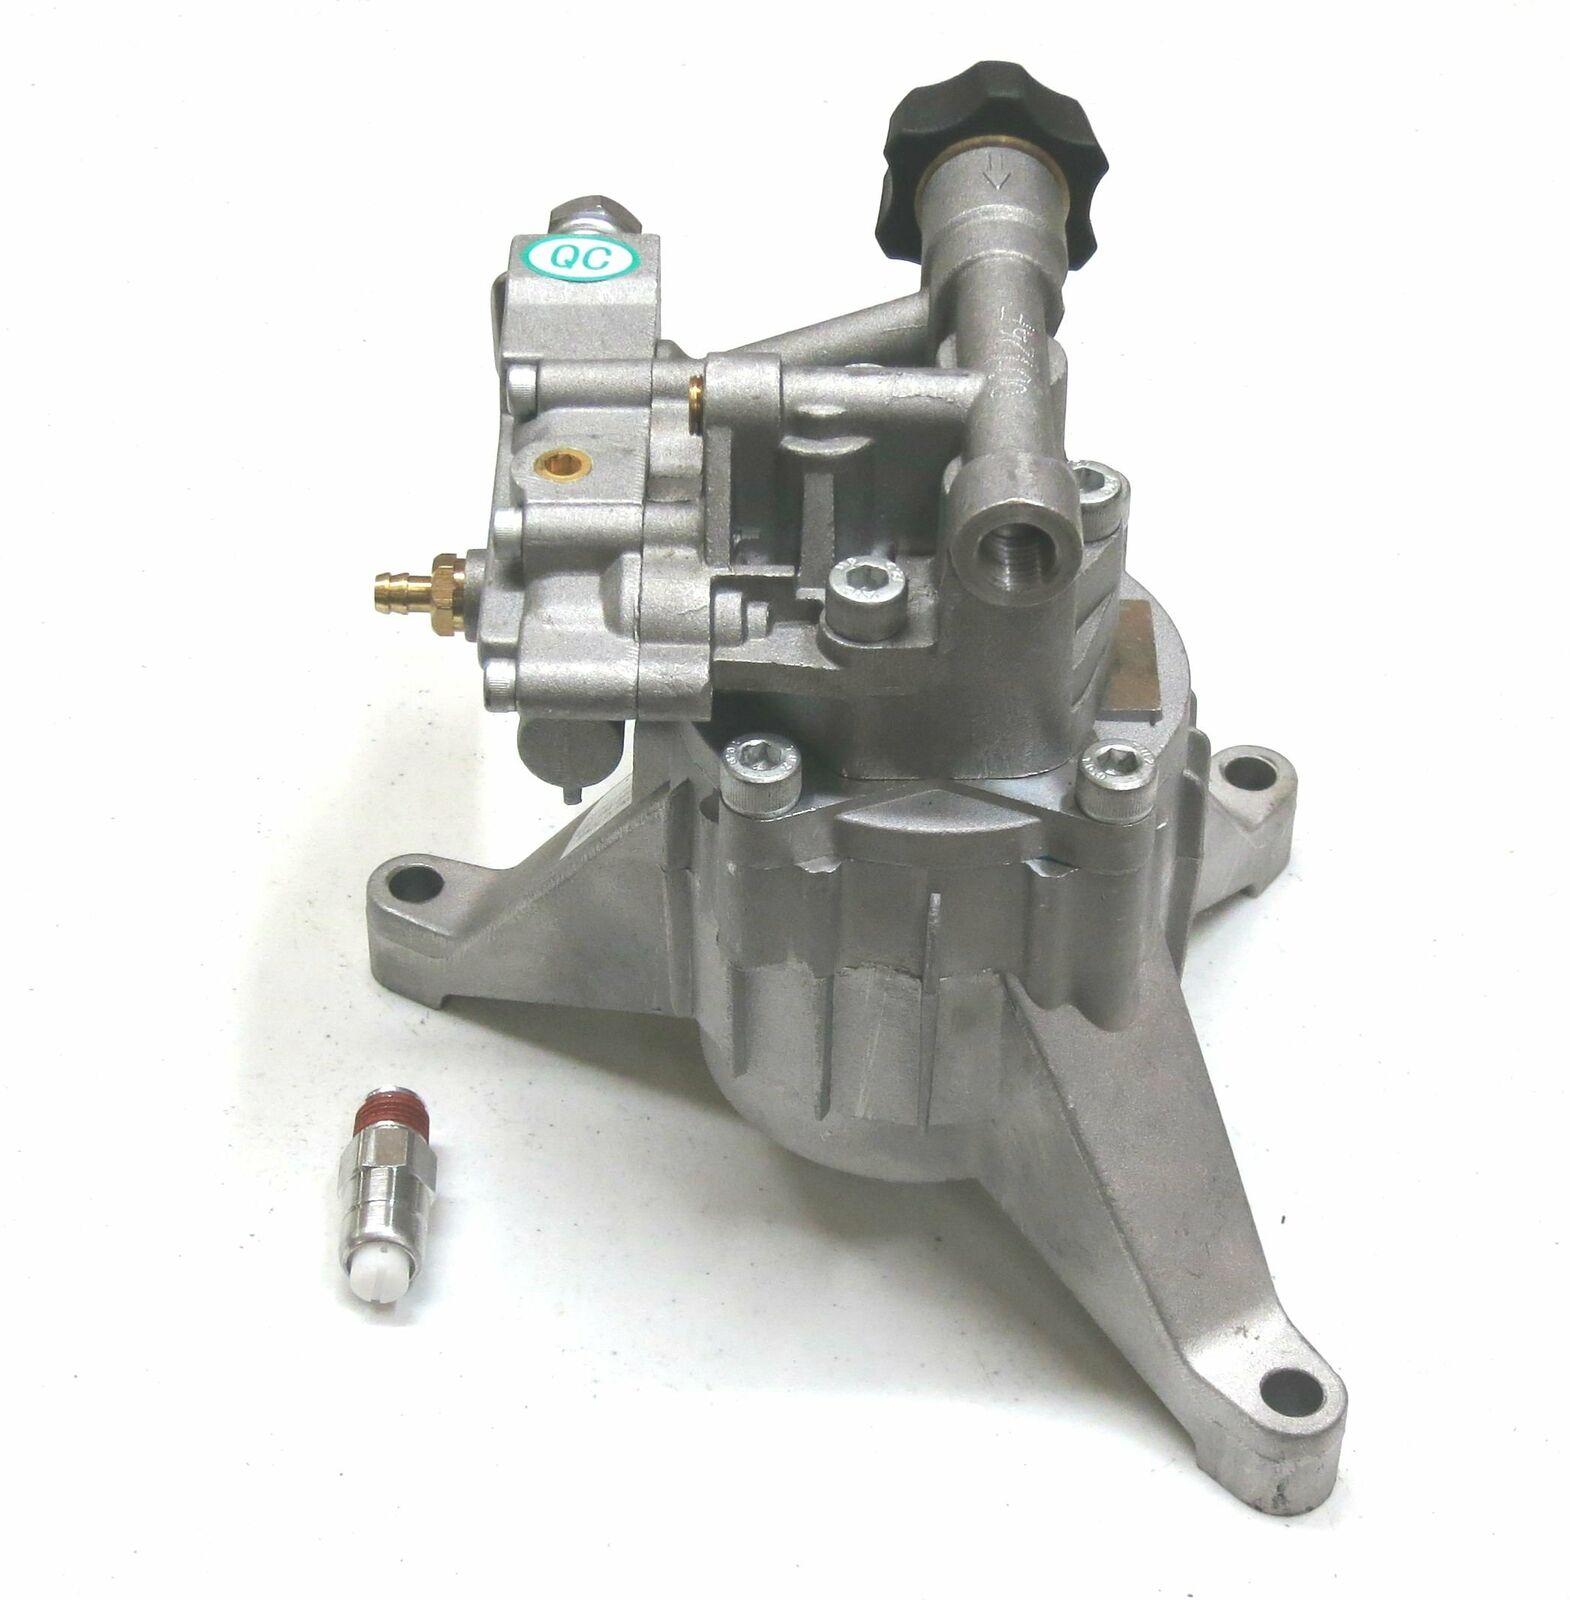 3100 PSI POWER PRESSURE WASHER WATER PUMP Upgraded  Homelite UT80993B UT80993D